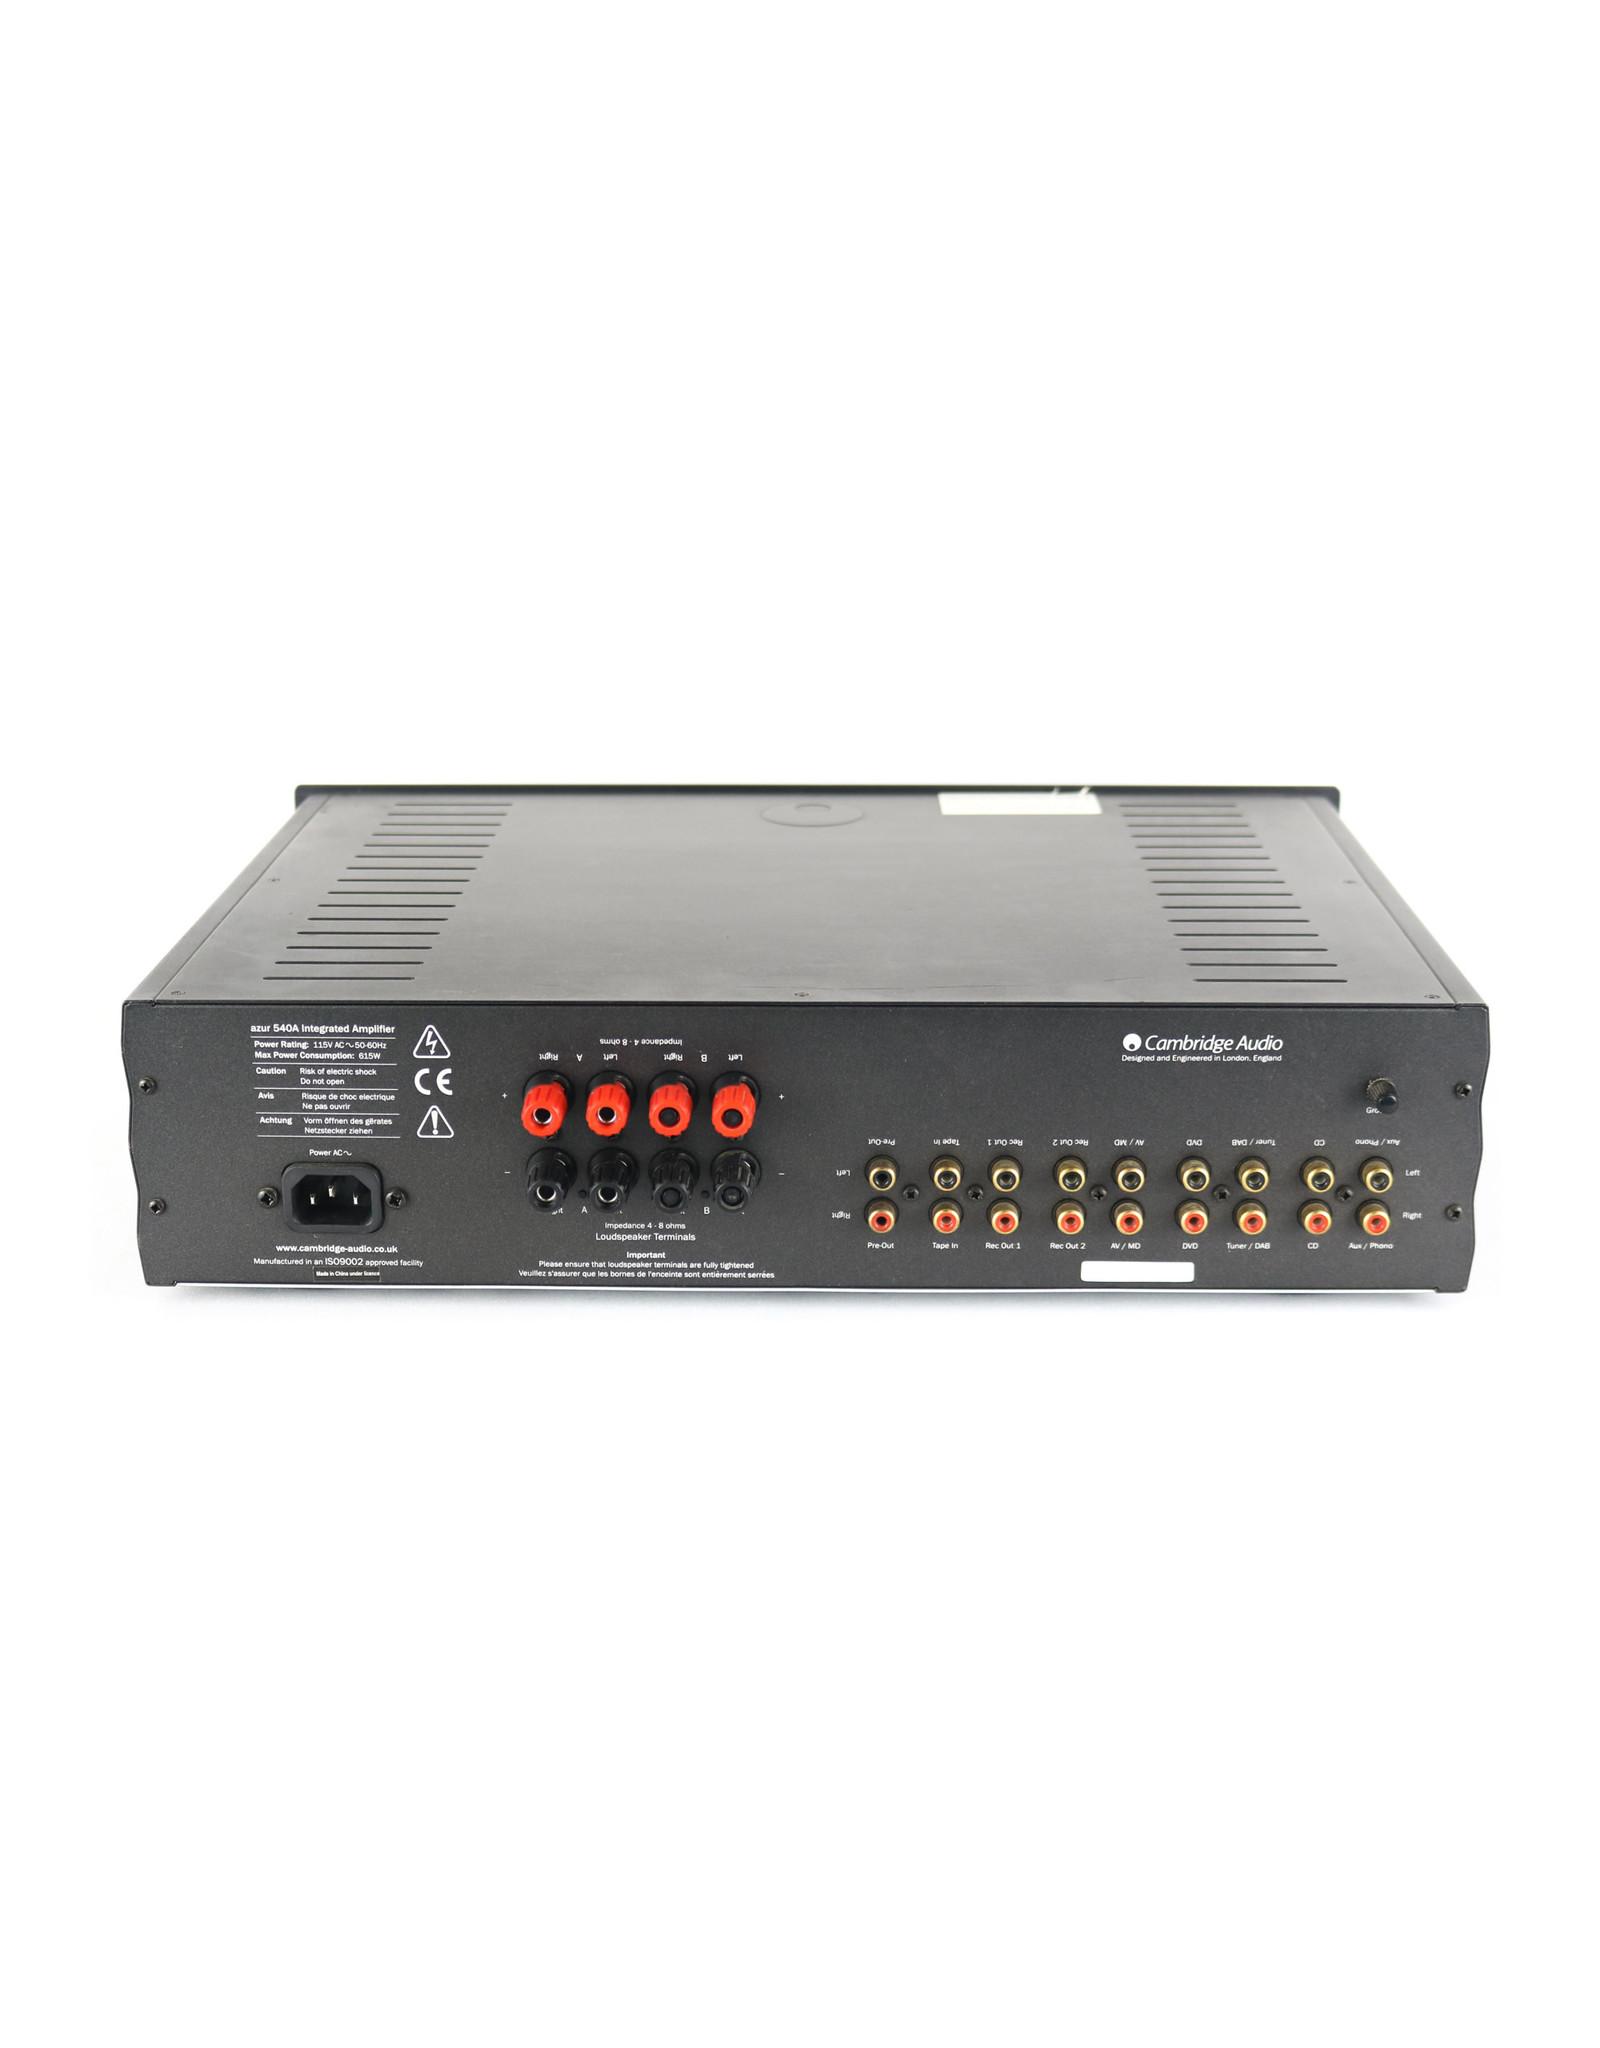 Cambridge Audio Cambridge Audio 540A Black Integrated Amp USED